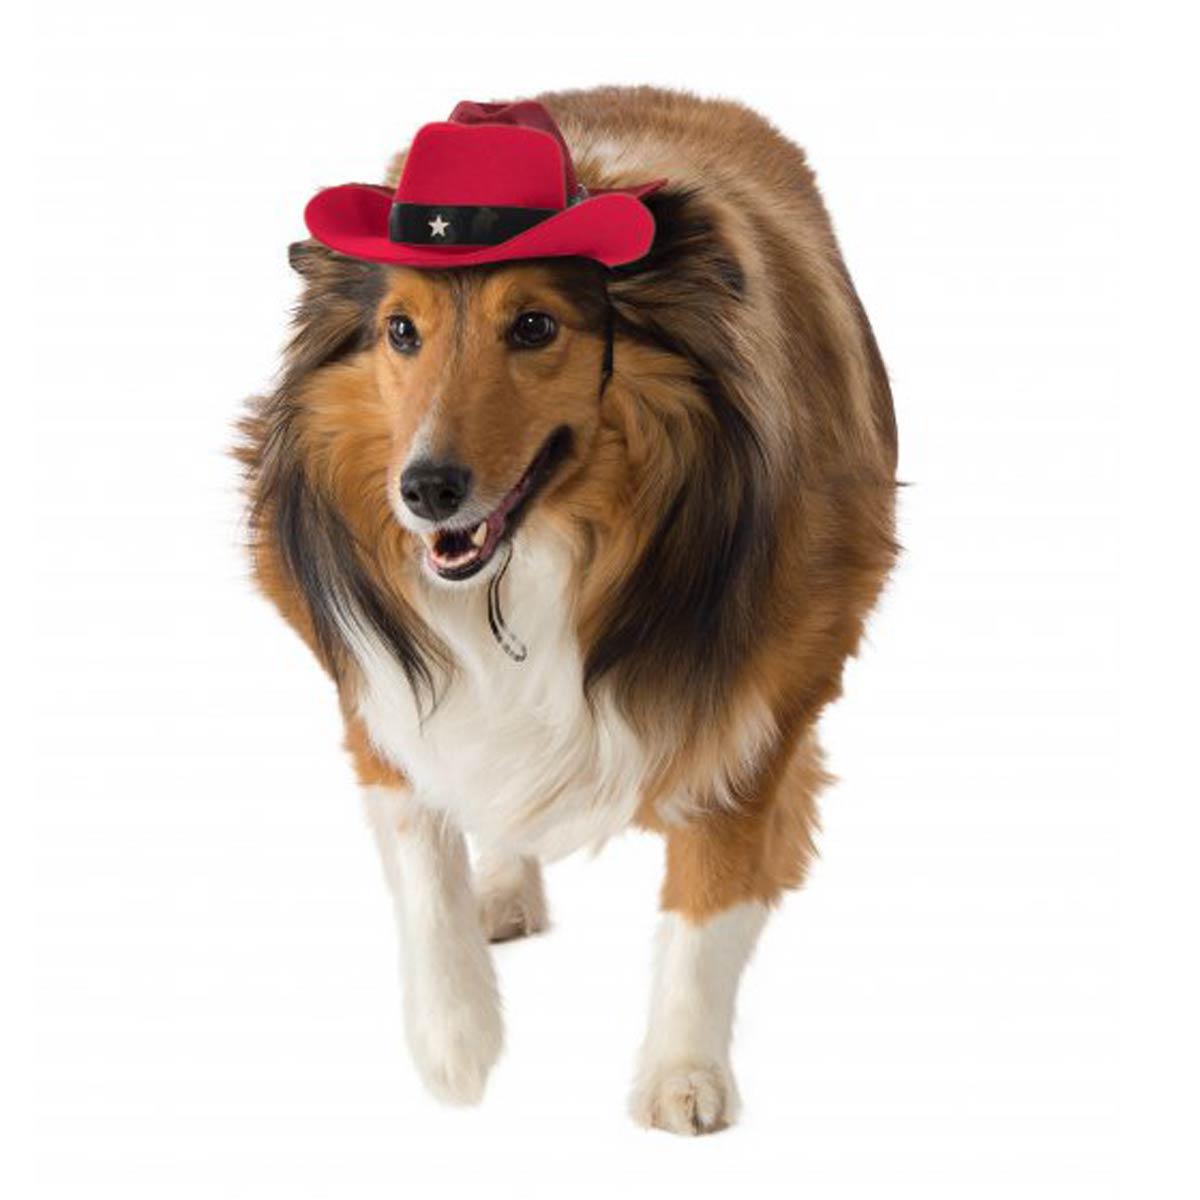 Cowboy Hat Pet Costume - Red